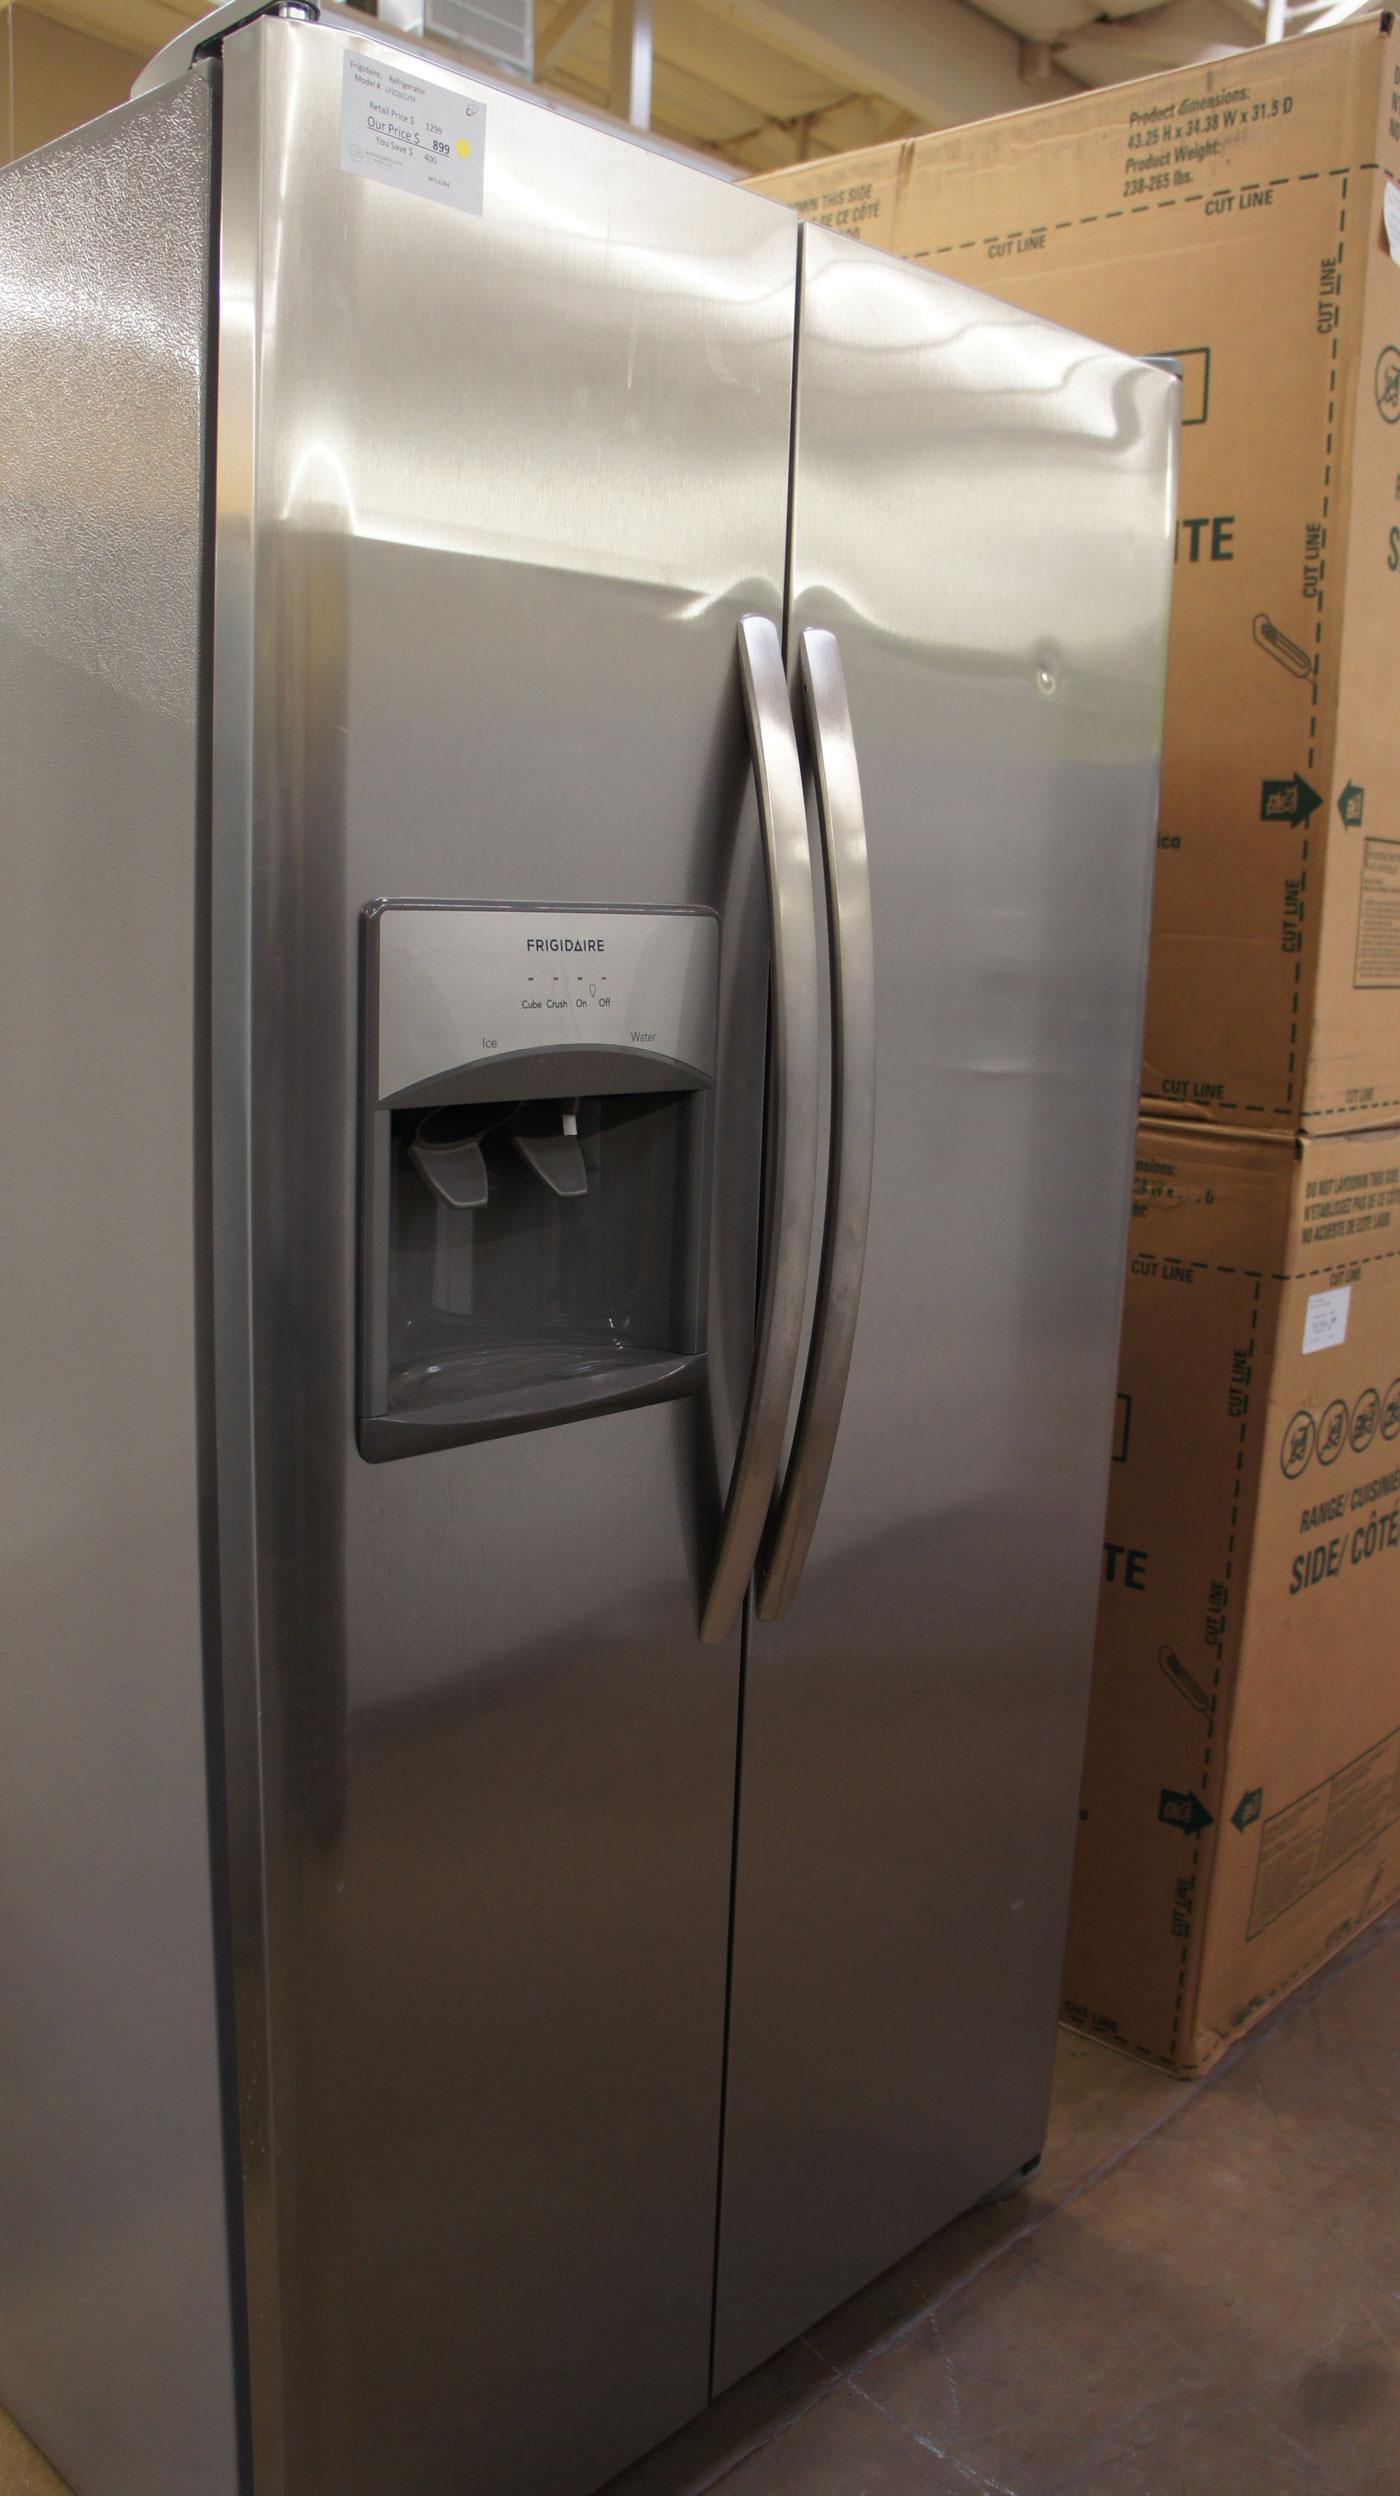 Frigidaire LFSS2612TF Side-By-Side Refrigerator